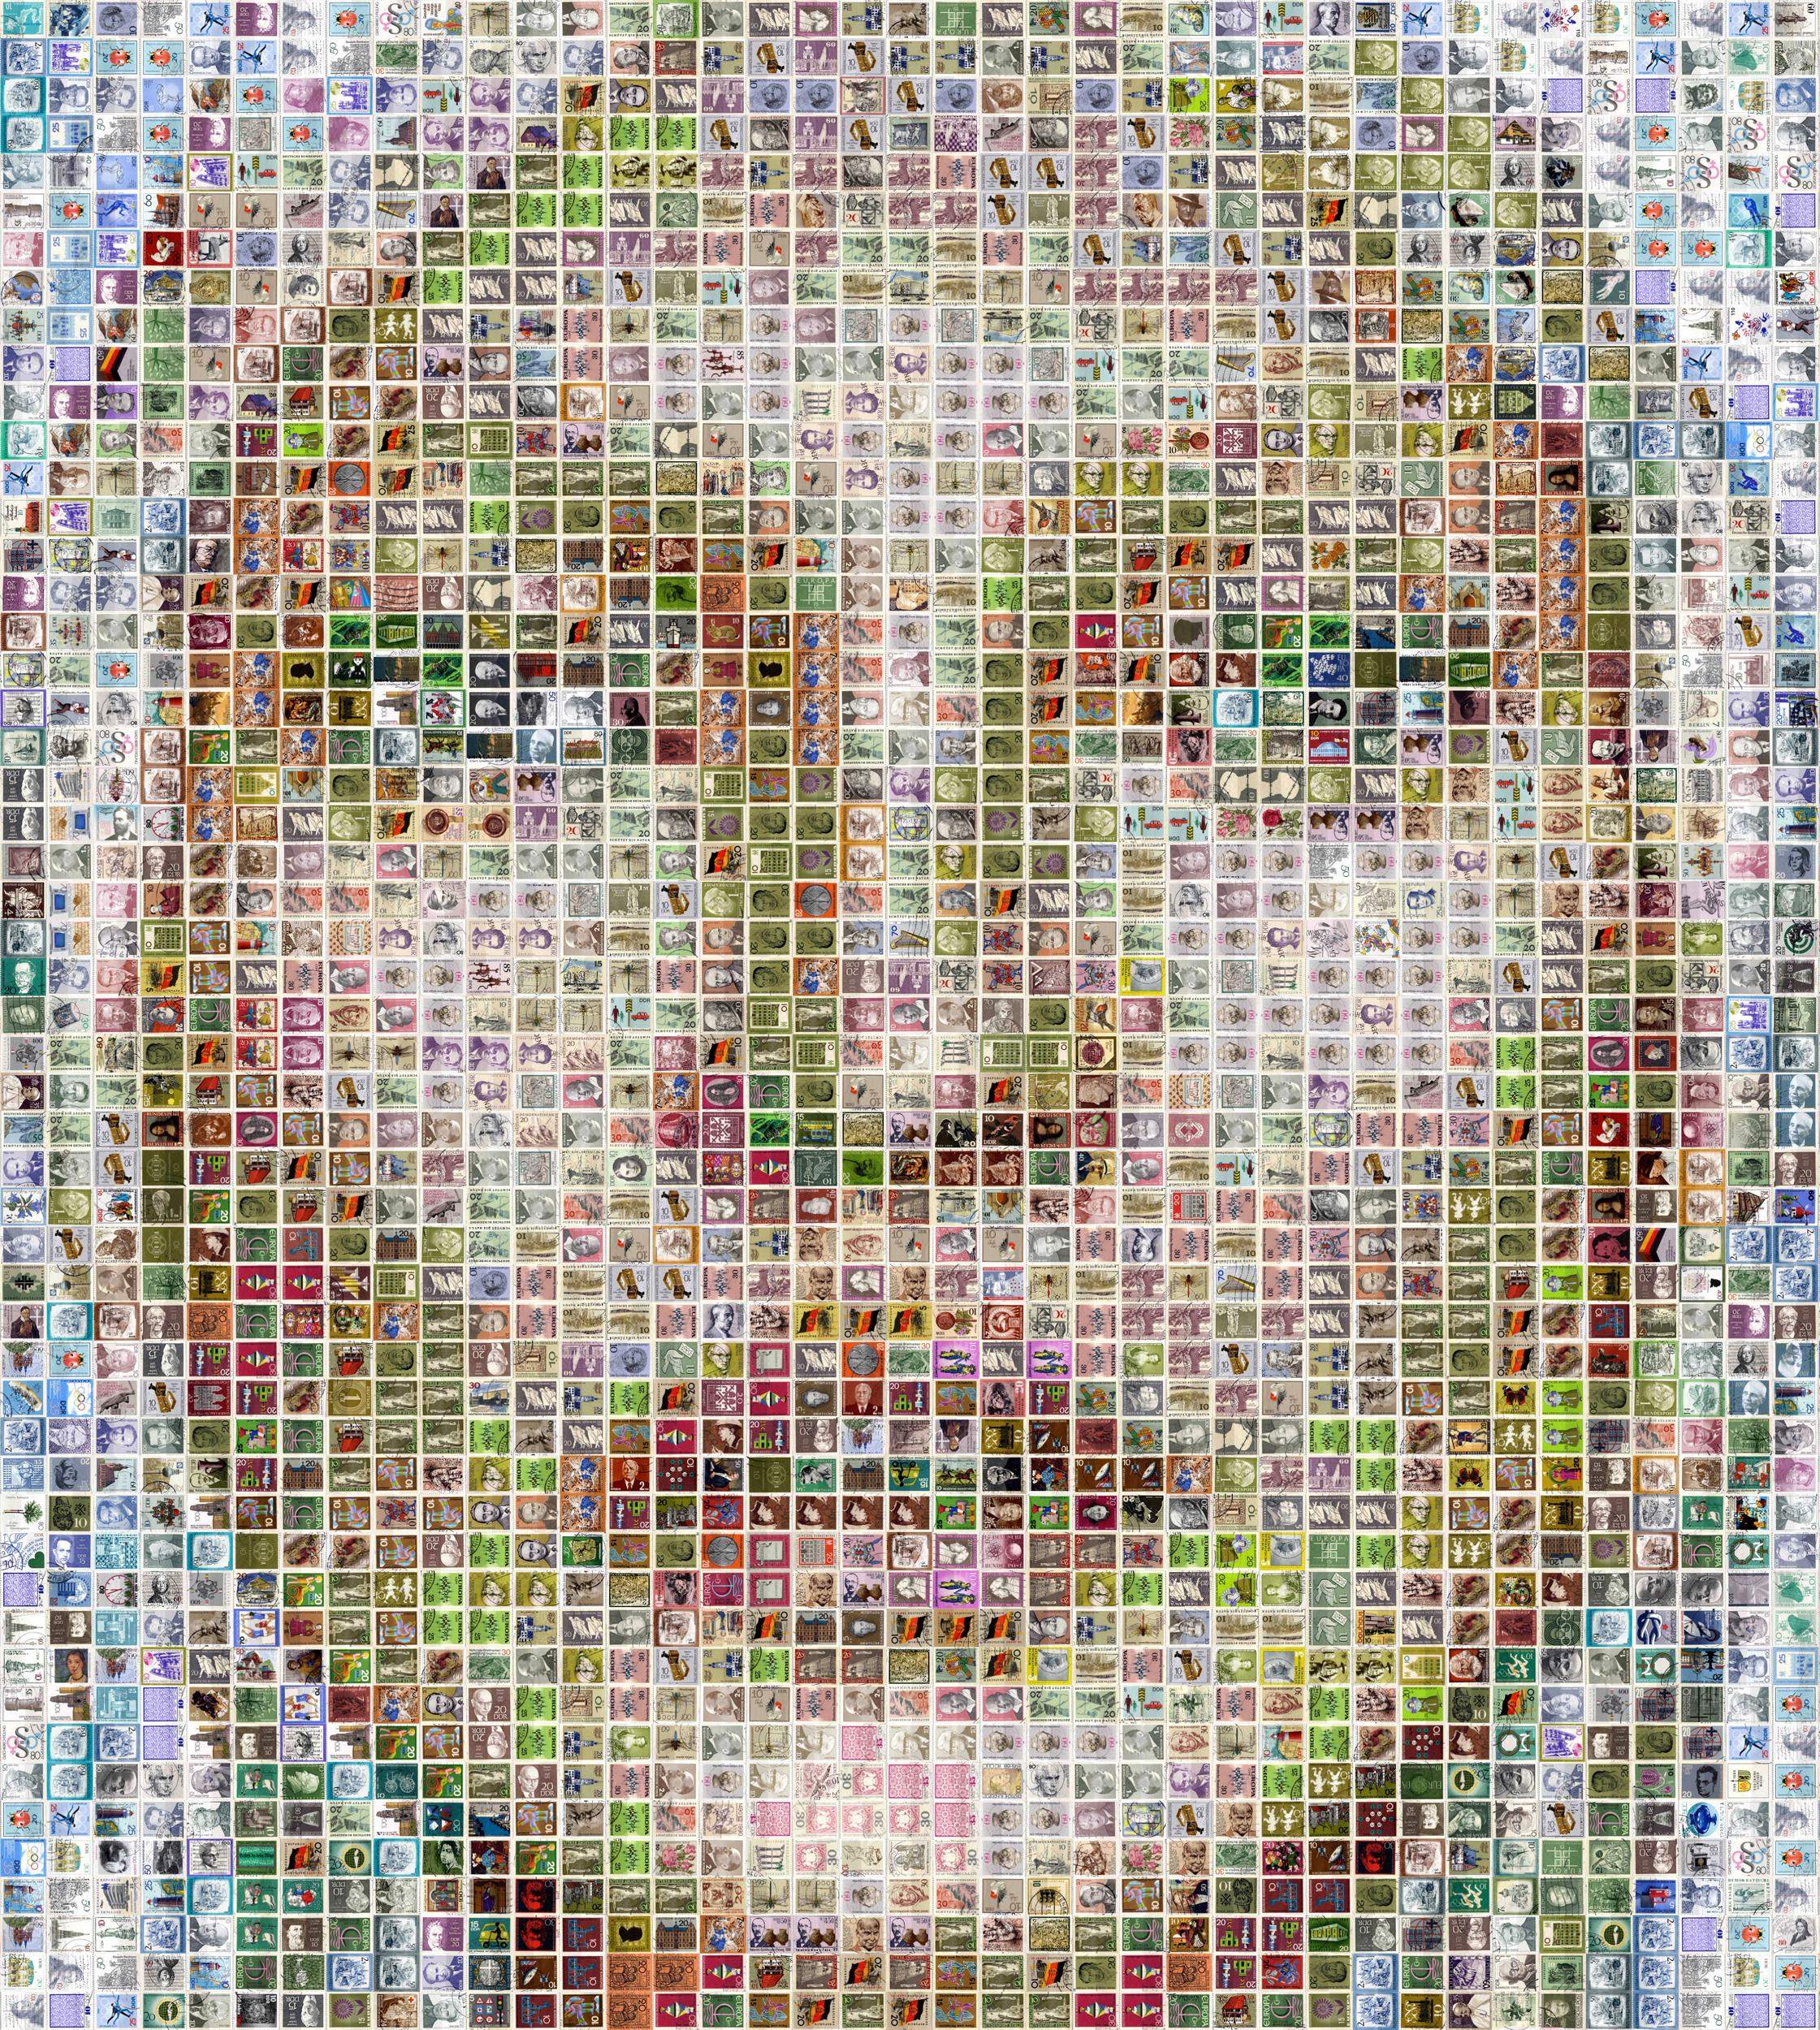 Kate Moss / W, 2013